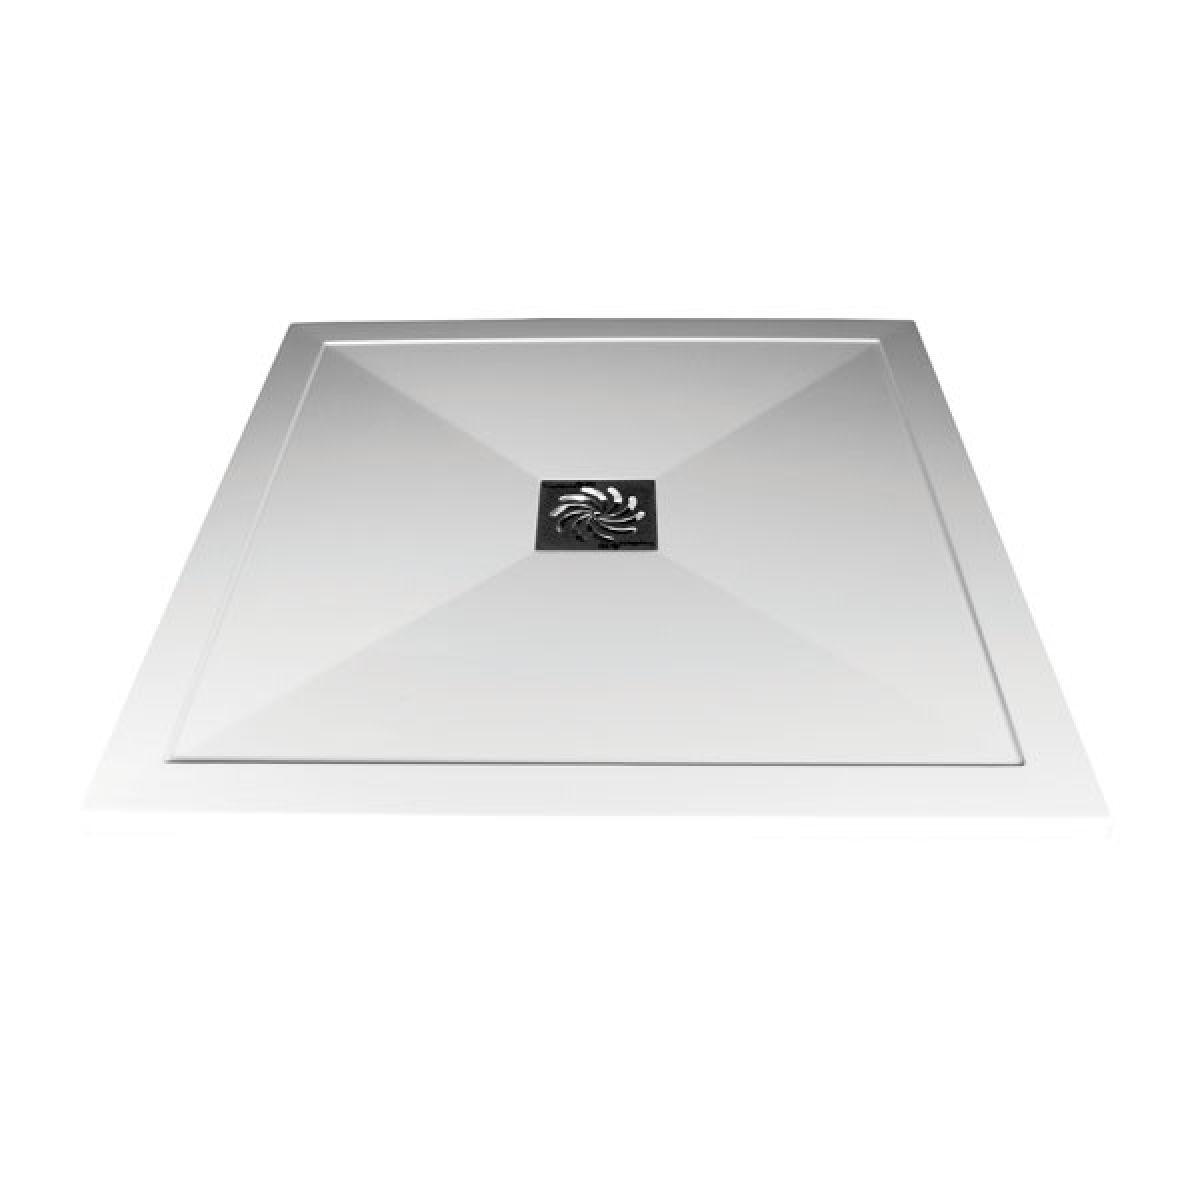 Frontline Slimline Square Shower Tray 900 x 900mm